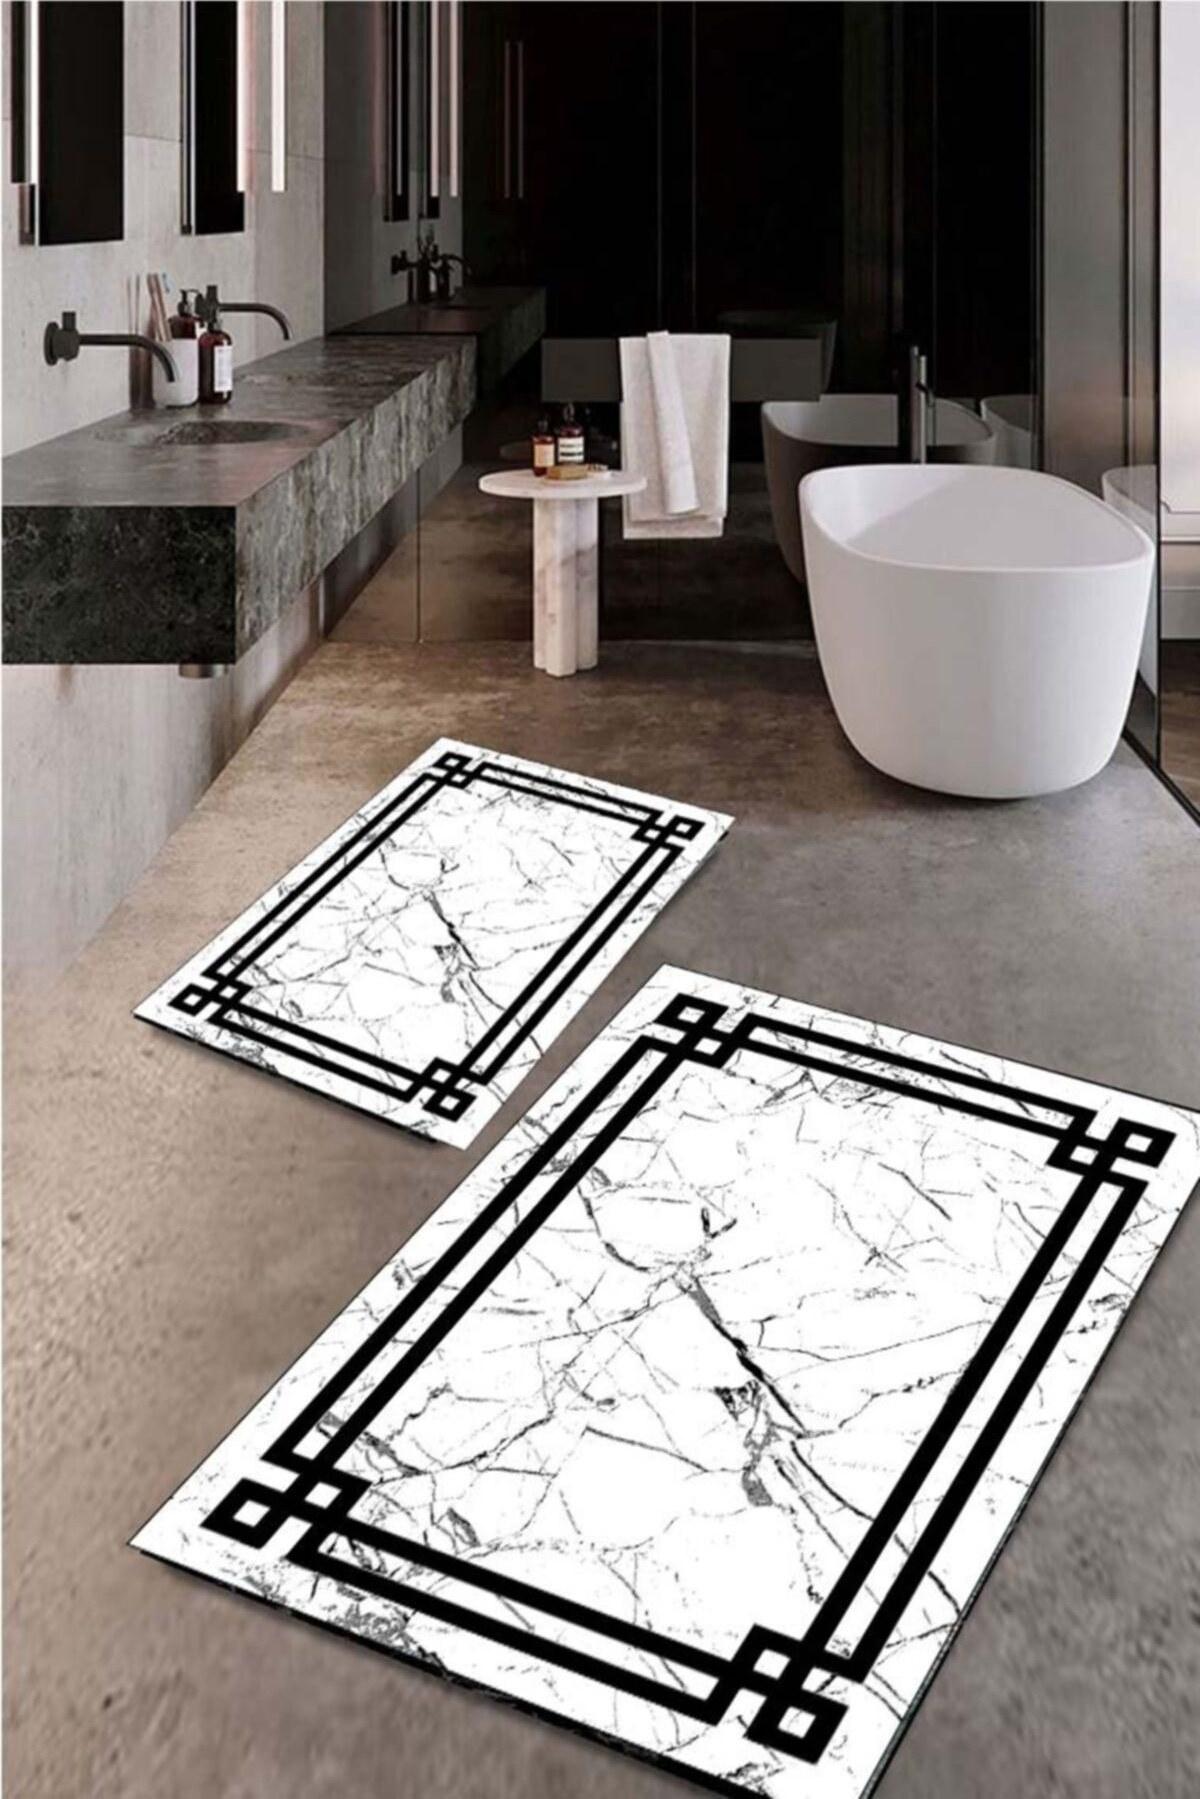 تصویر زیرپایی قابل شستشو حمام کف لیز نمیخورد مشکی 50x60cm 60x100cm برند Sare Halı کد 1628058612